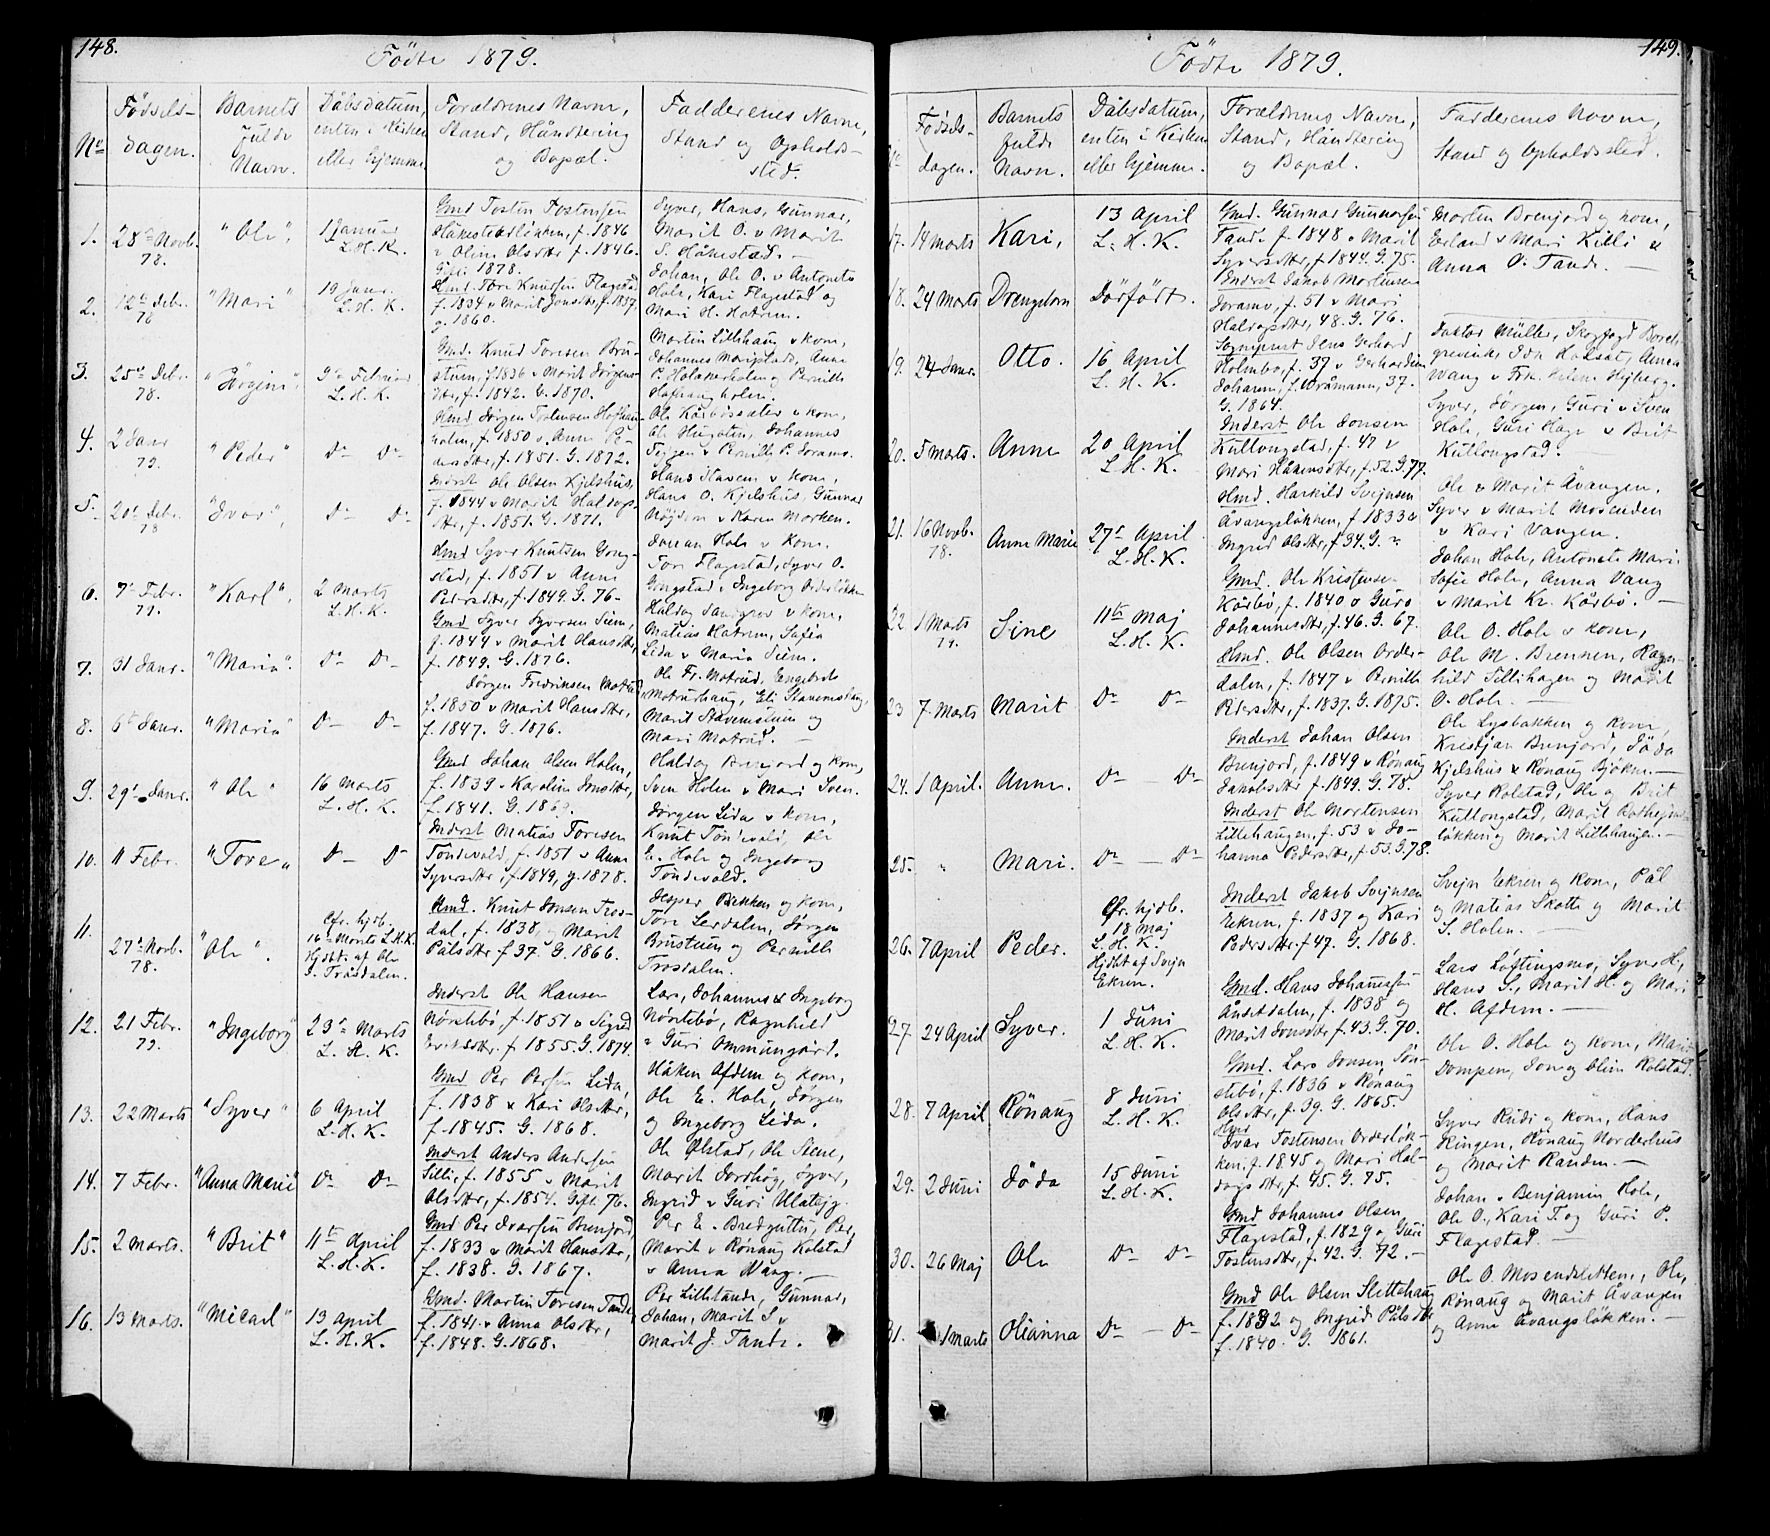 SAH, Lesja prestekontor, Klokkerbok nr. 5, 1850-1894, s. 148-149